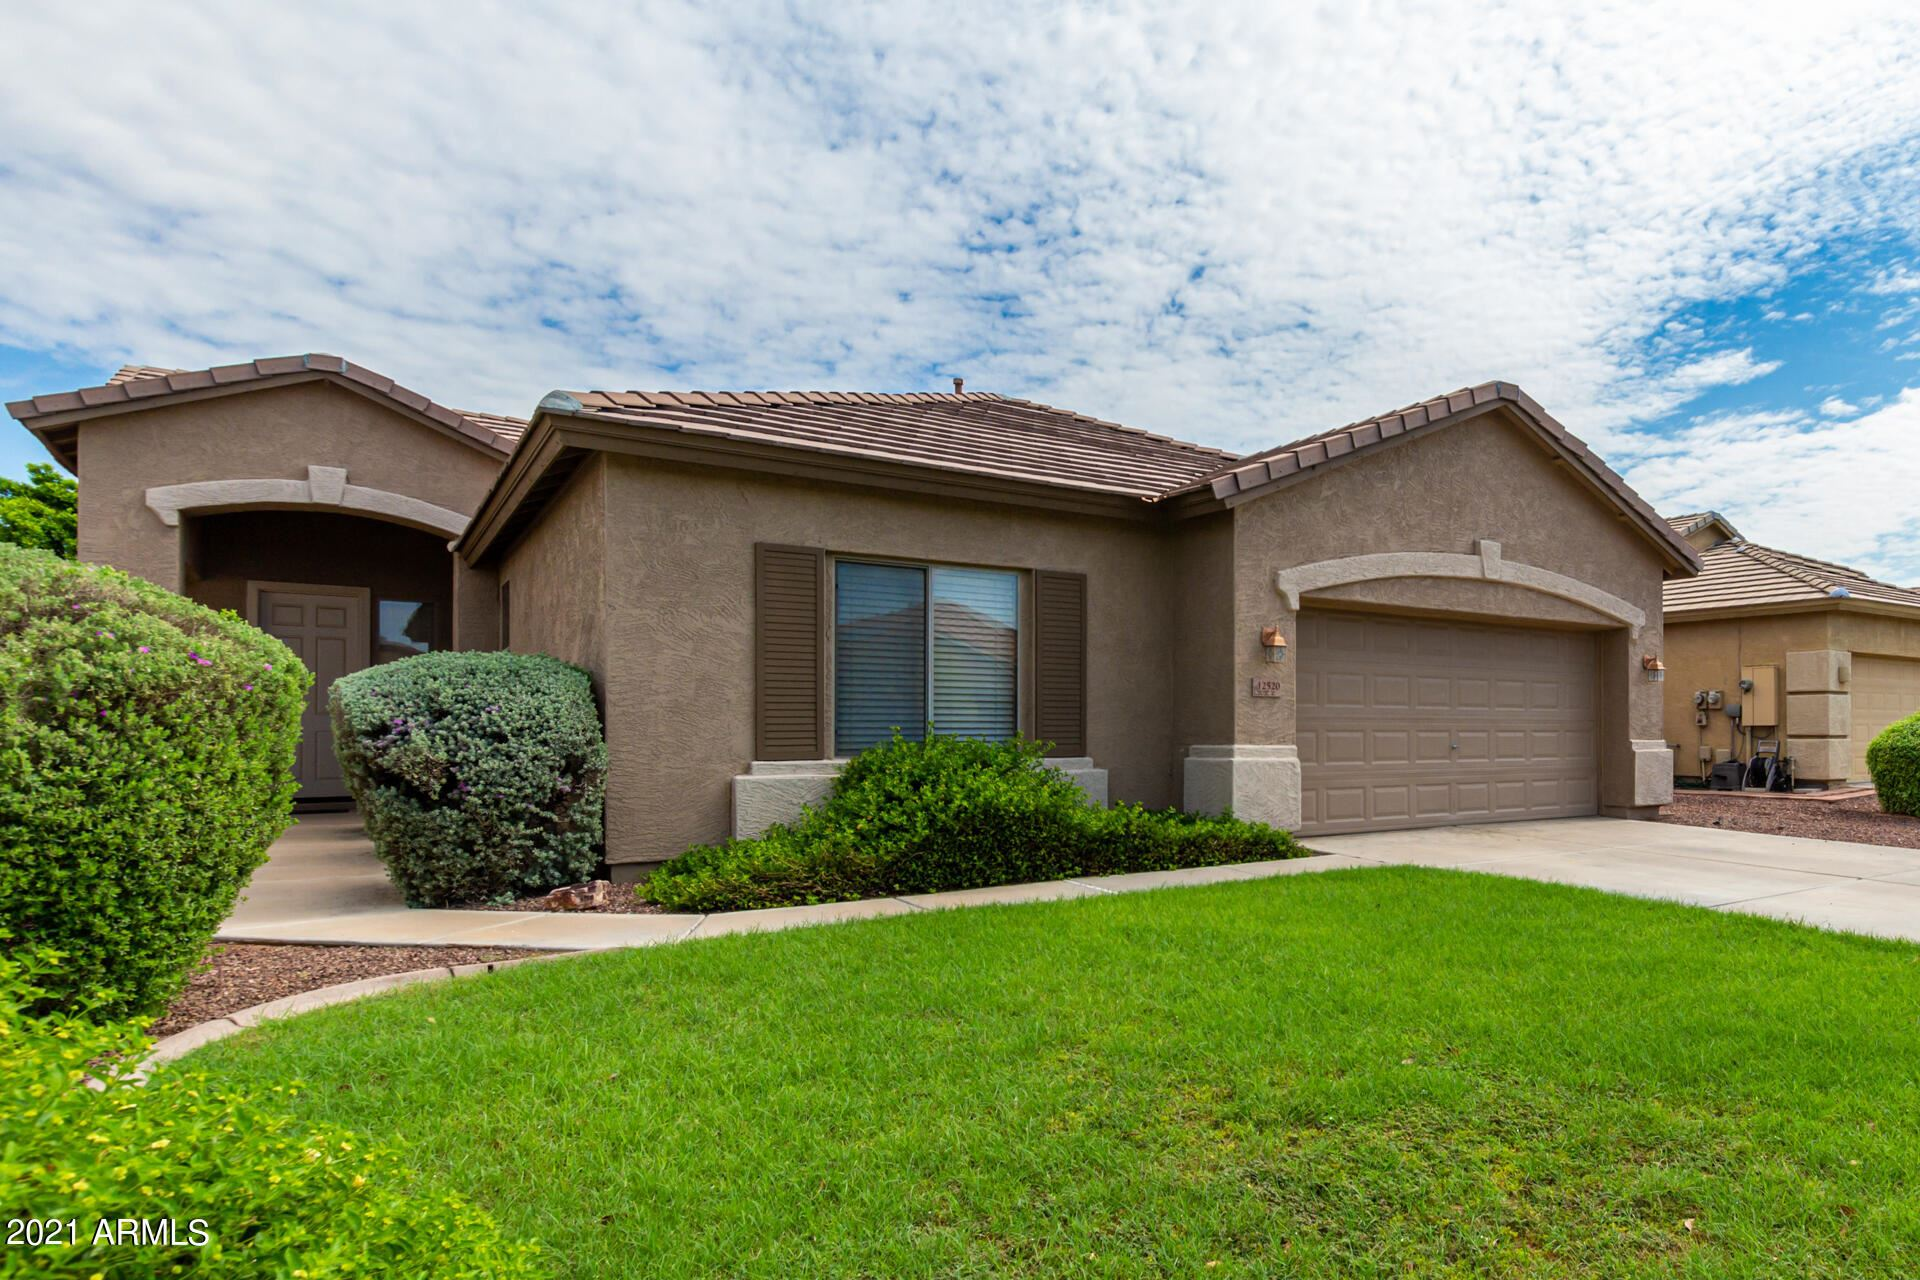 Photo of 12520 W MODESTO Drive, Litchfield Park, AZ 85340 (MLS # 6270746)